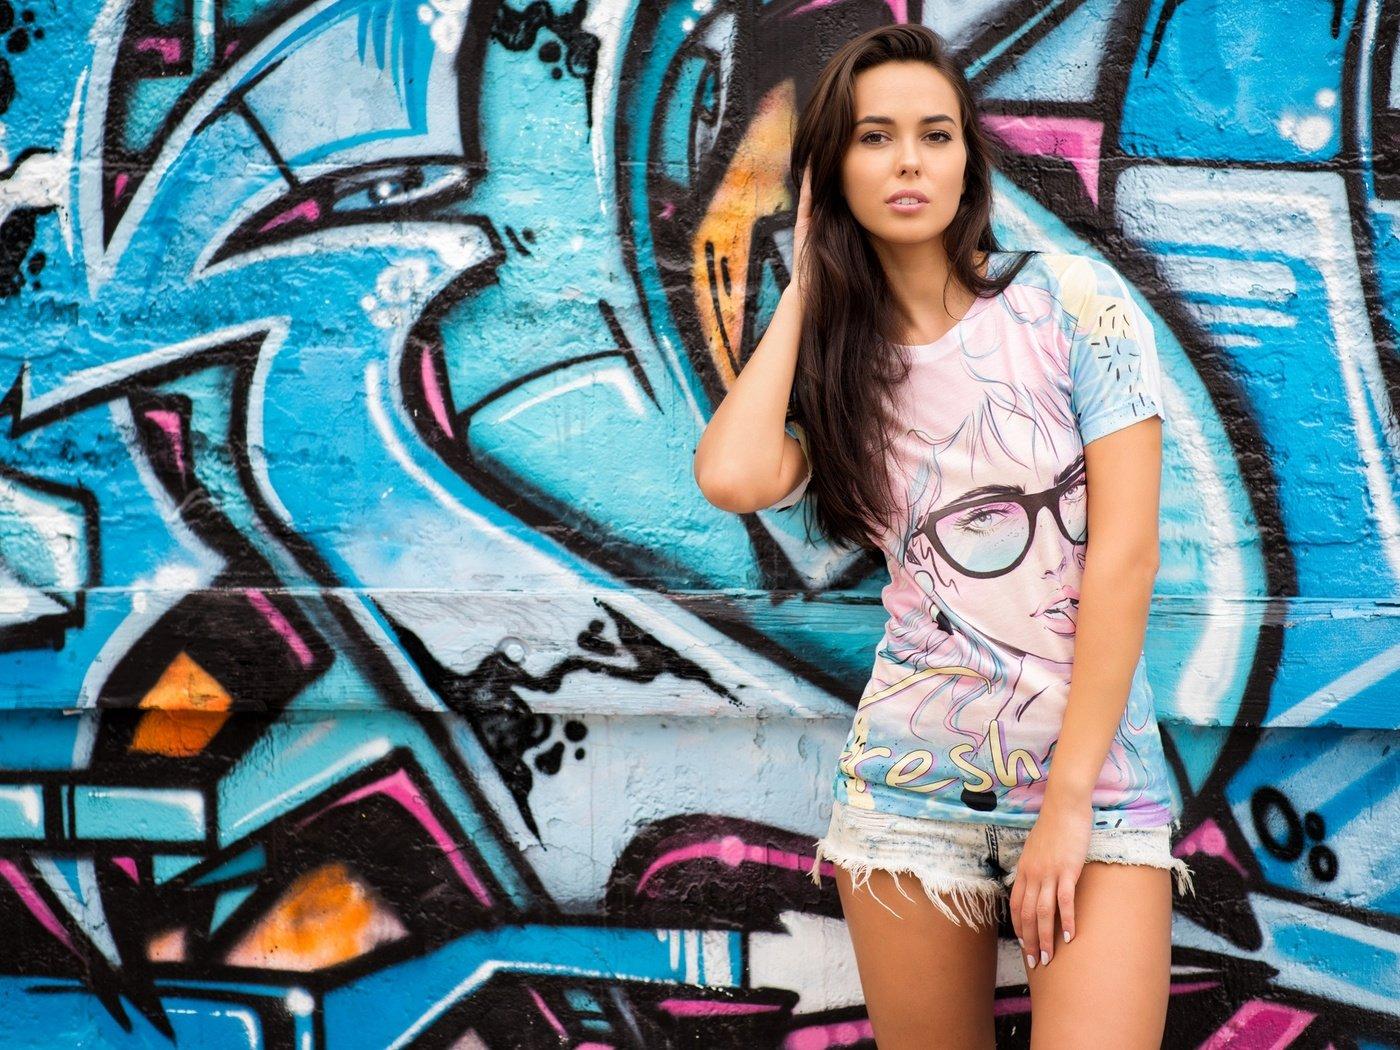 Картинки девушка у стены с граффити